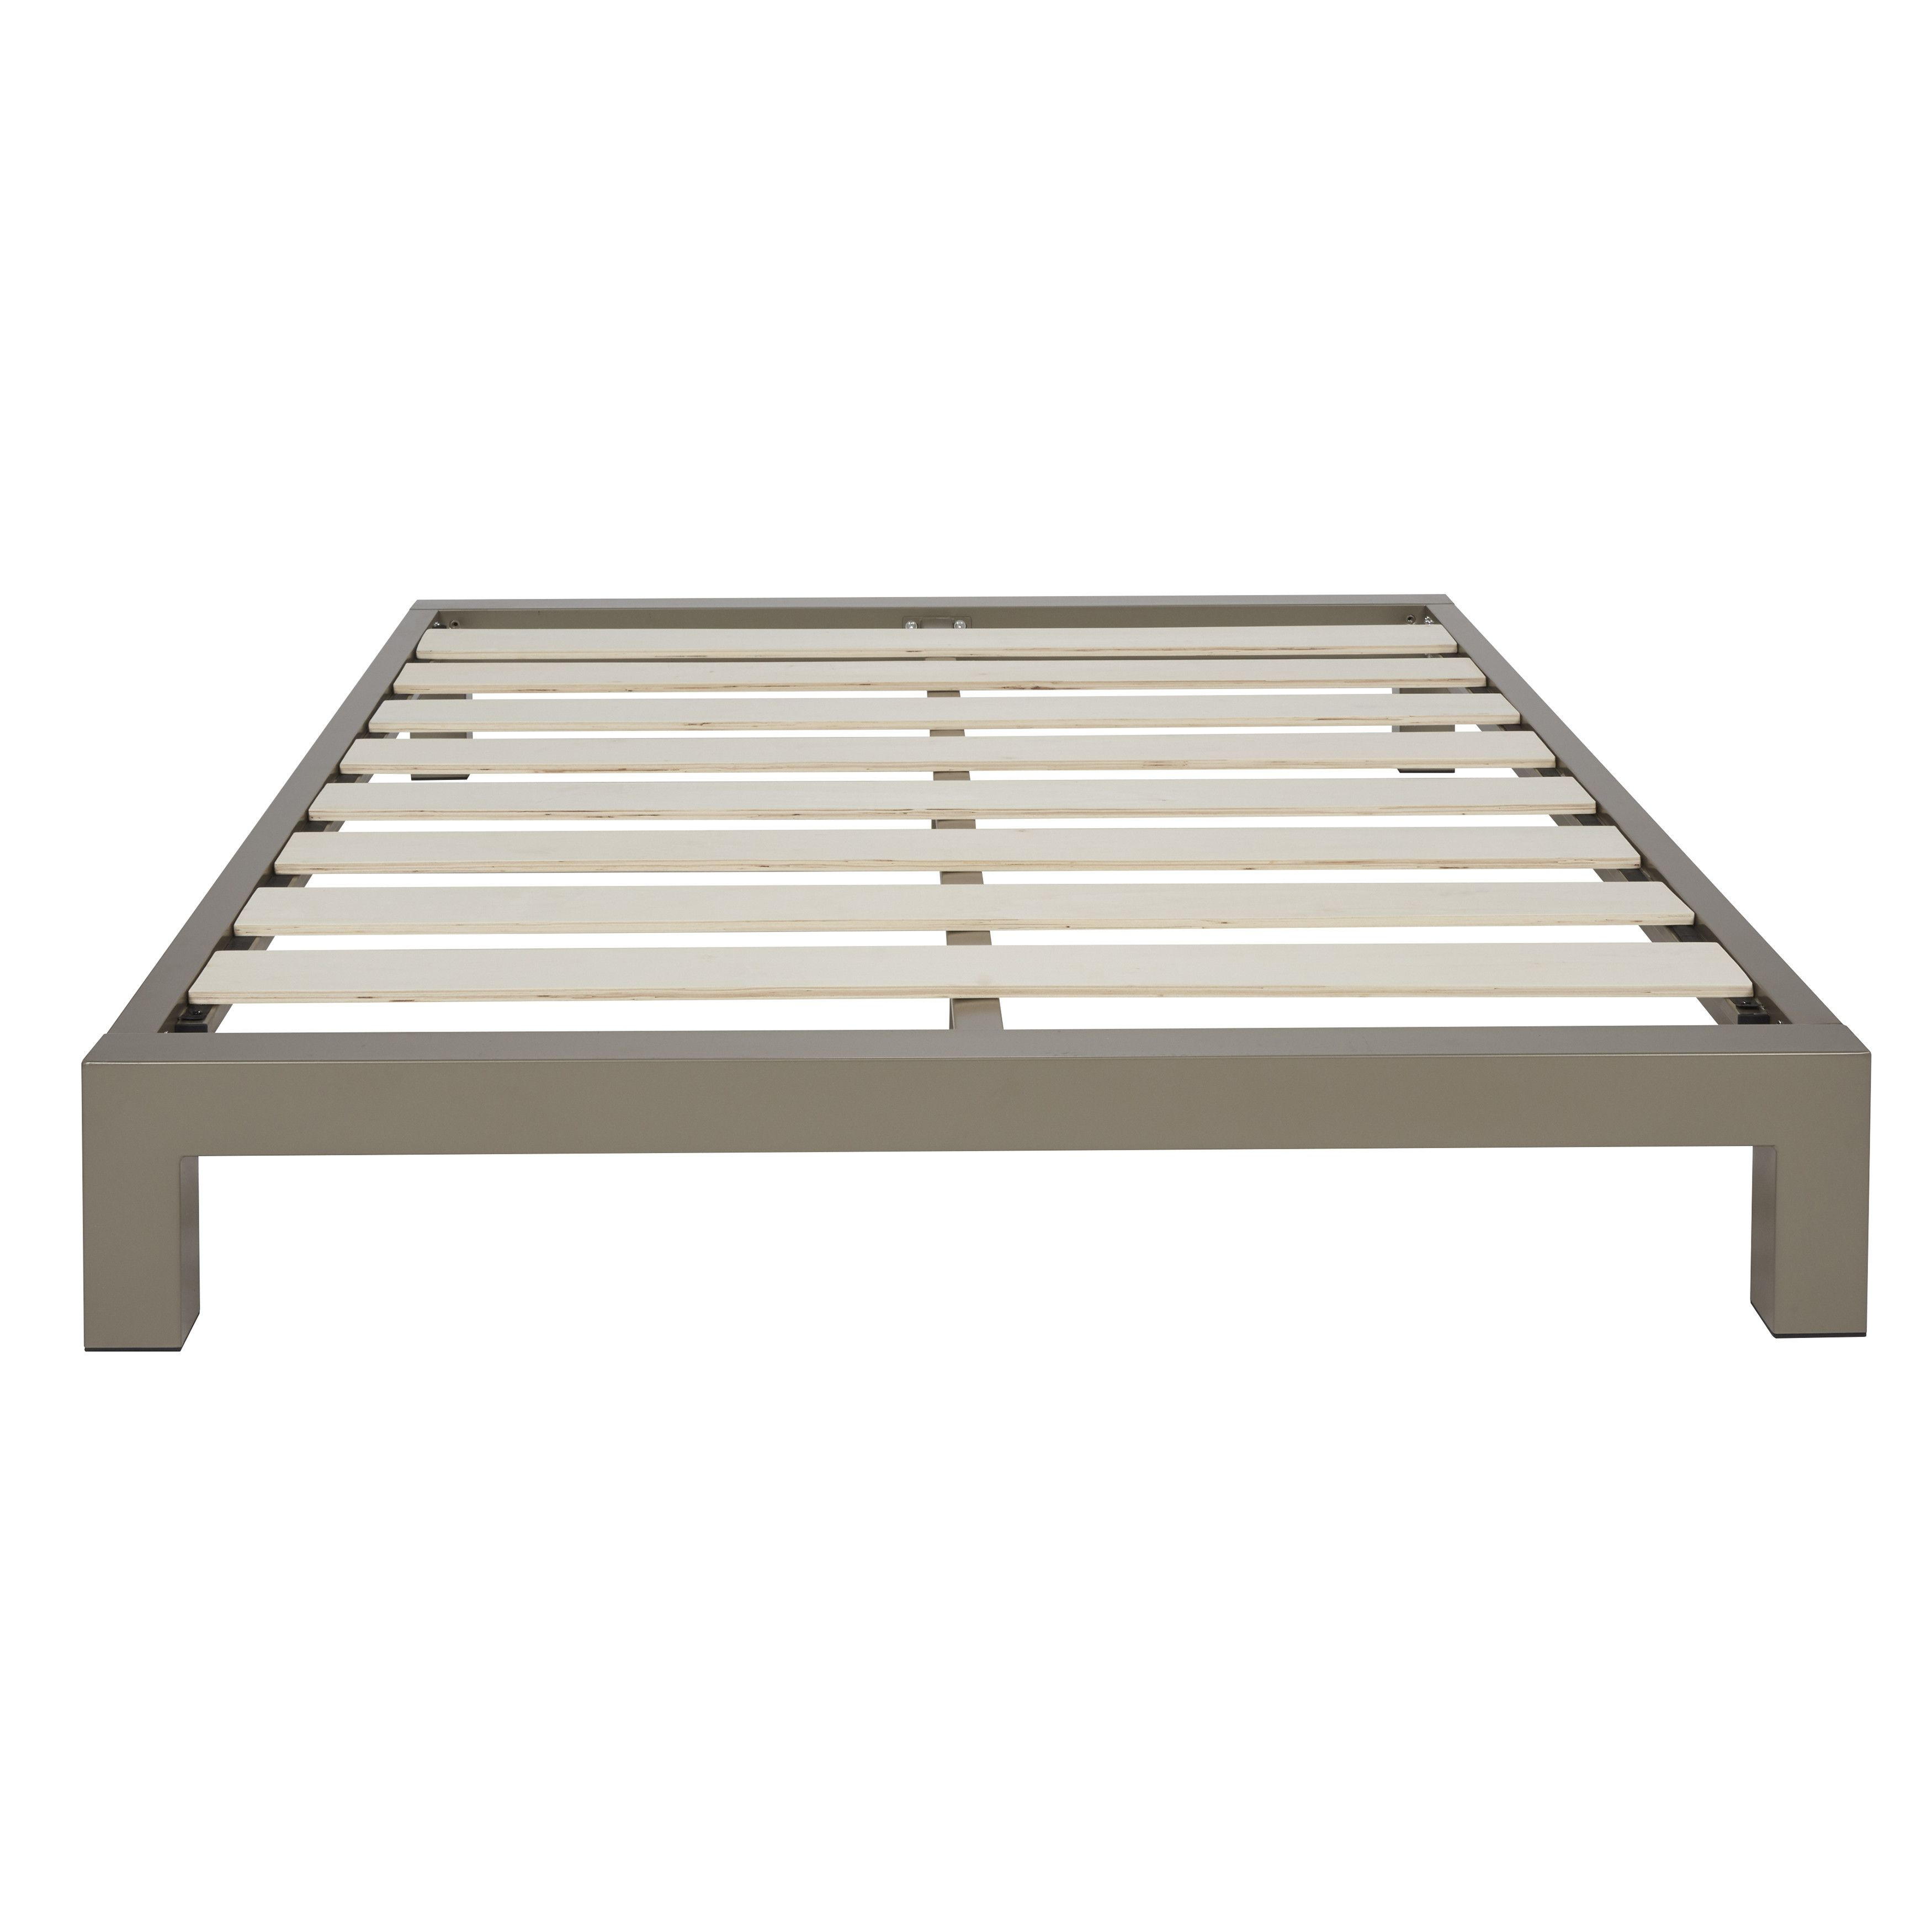 In Style Furnishings Stella Platform Bed Metal Platform Bed